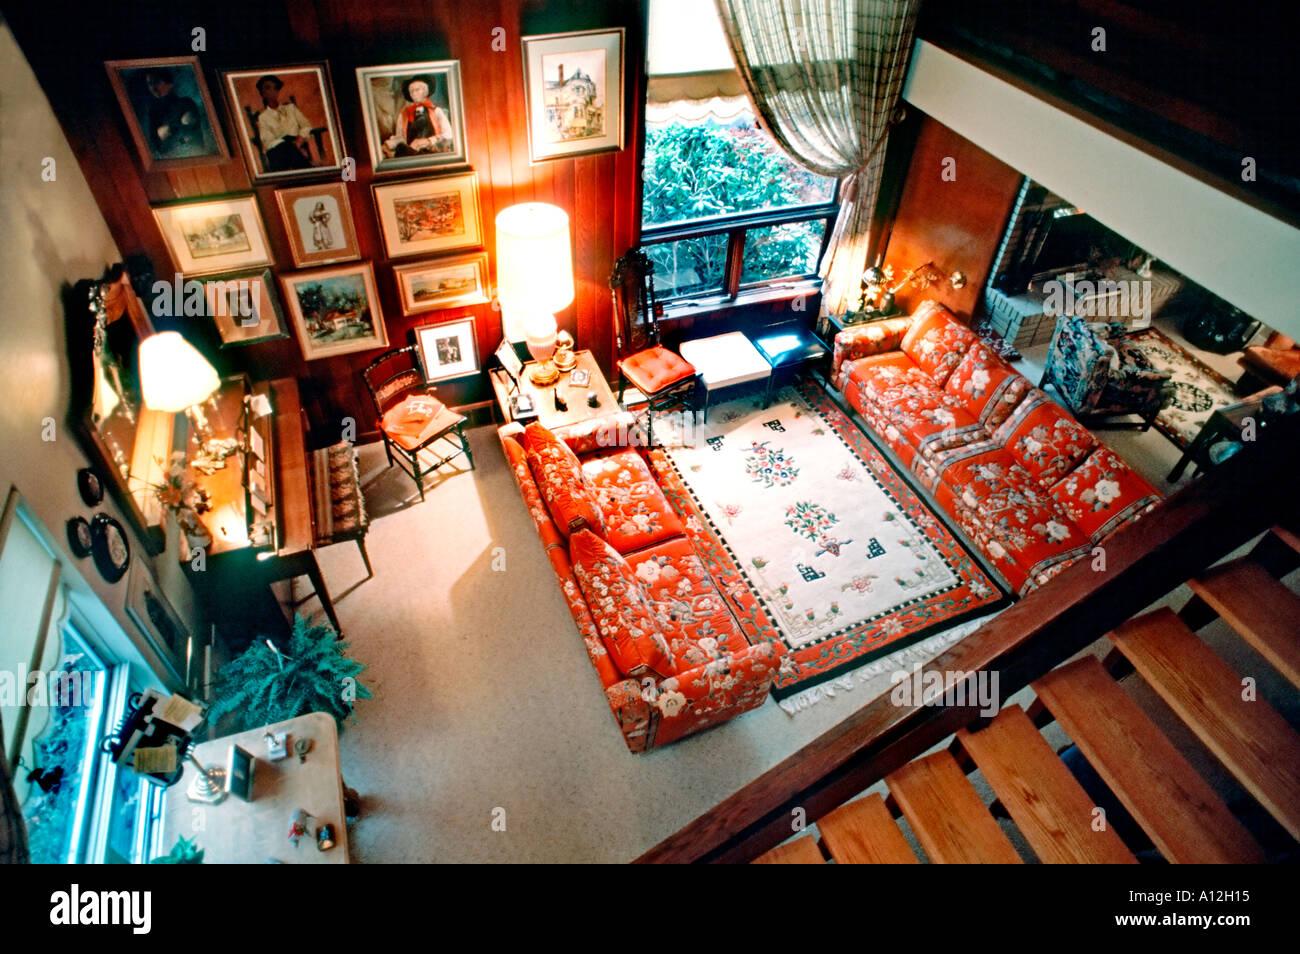 Pittsburgh, PA, USA American Single Family House, Interior Open Living Room, High Angle, suburban house Stock Photo